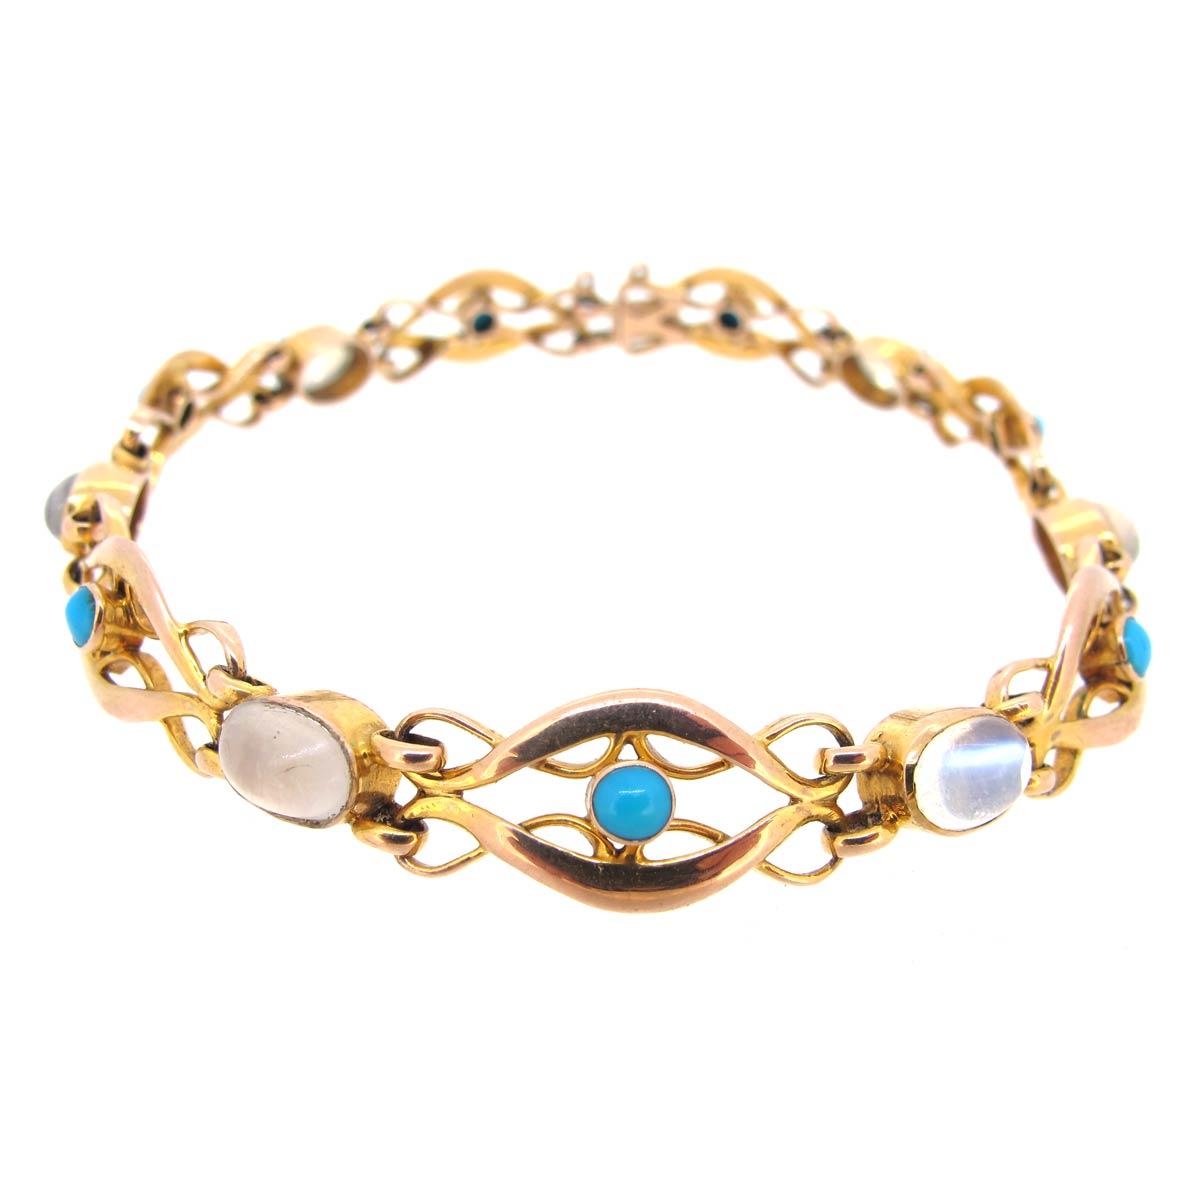 Antique Turquoise & Moonstone Bracelet